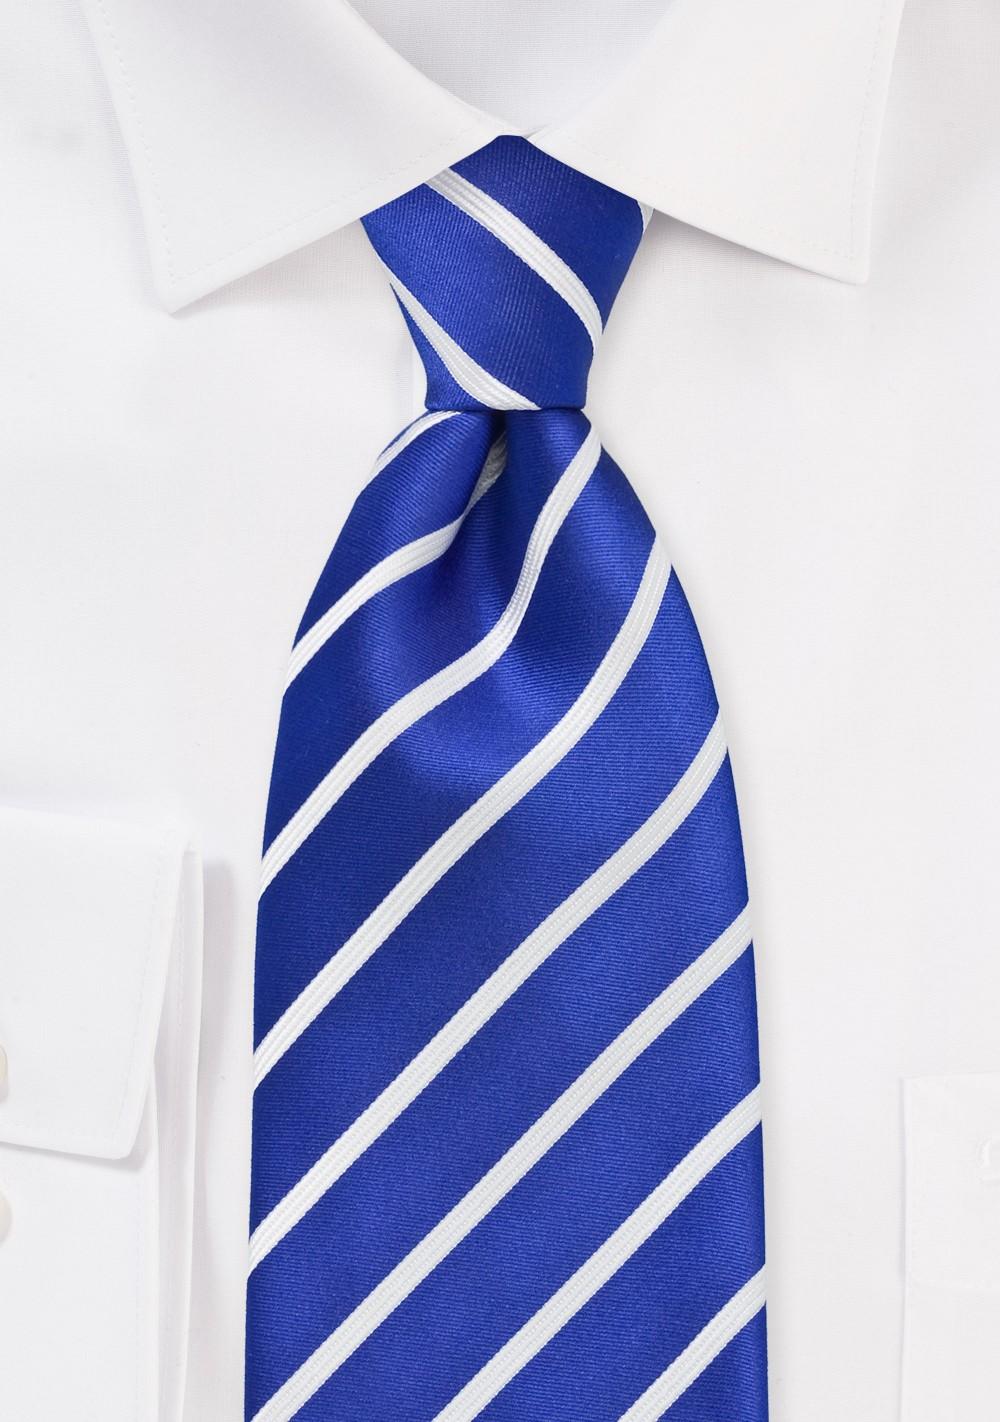 Marine Blue and White Tie